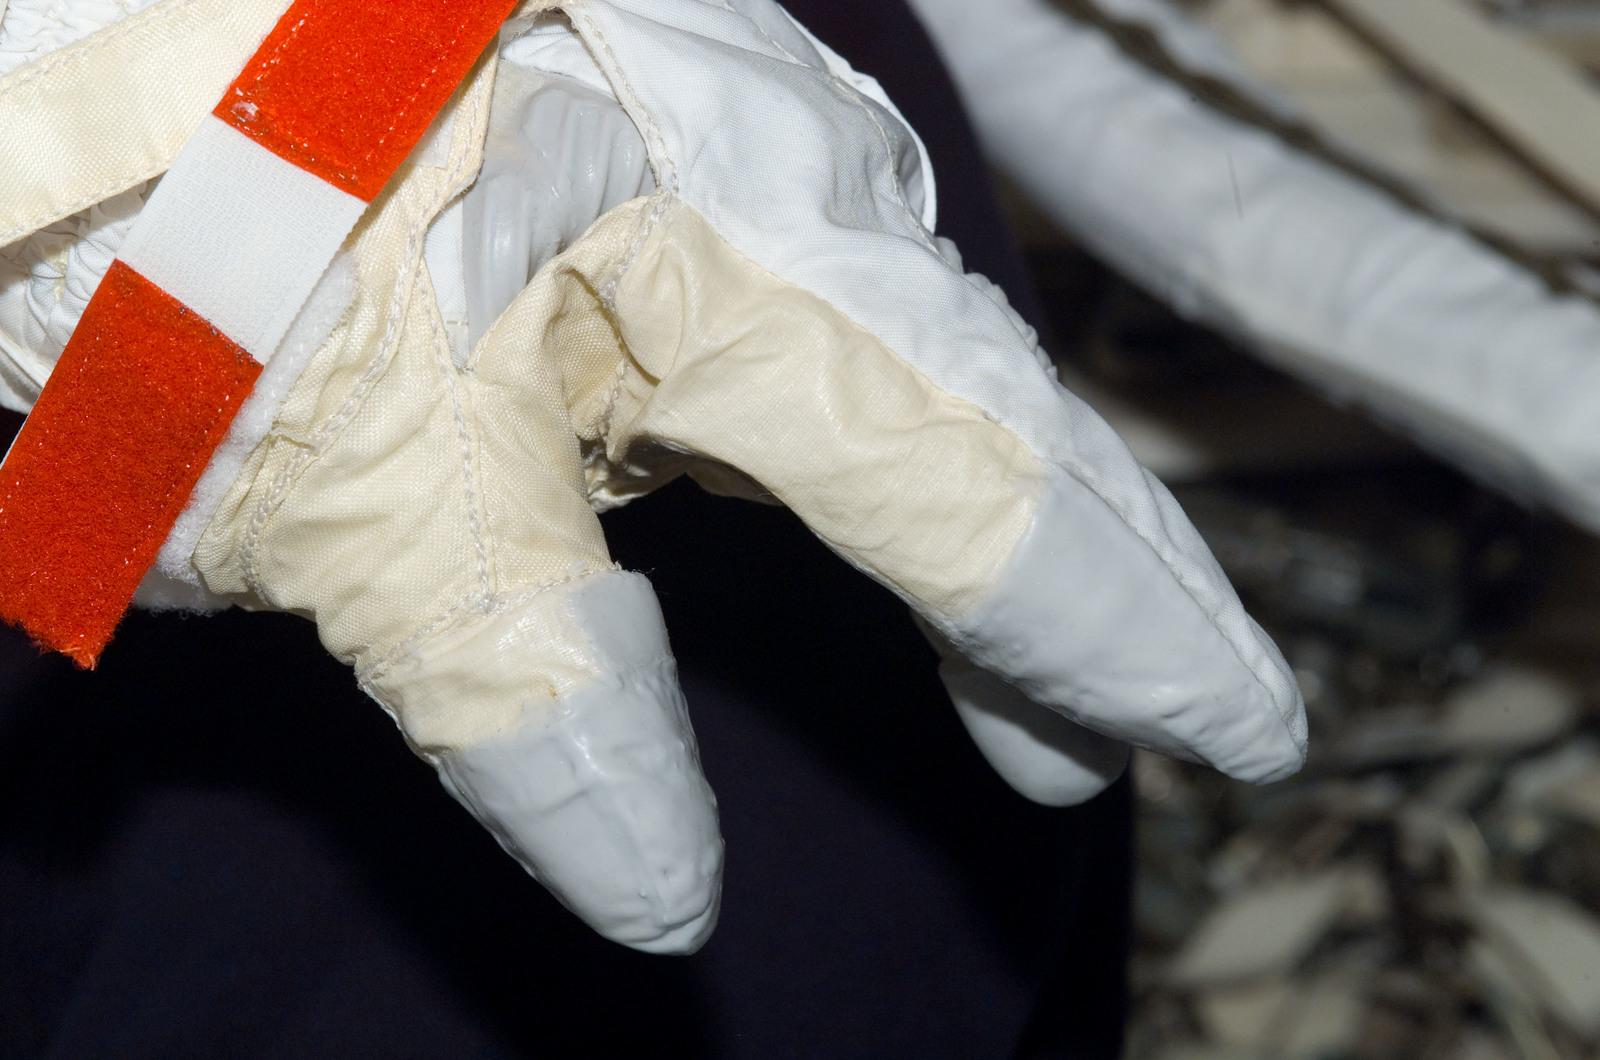 S122E008716 - STS-122 - Inspection of EMU Glove after EVA 3